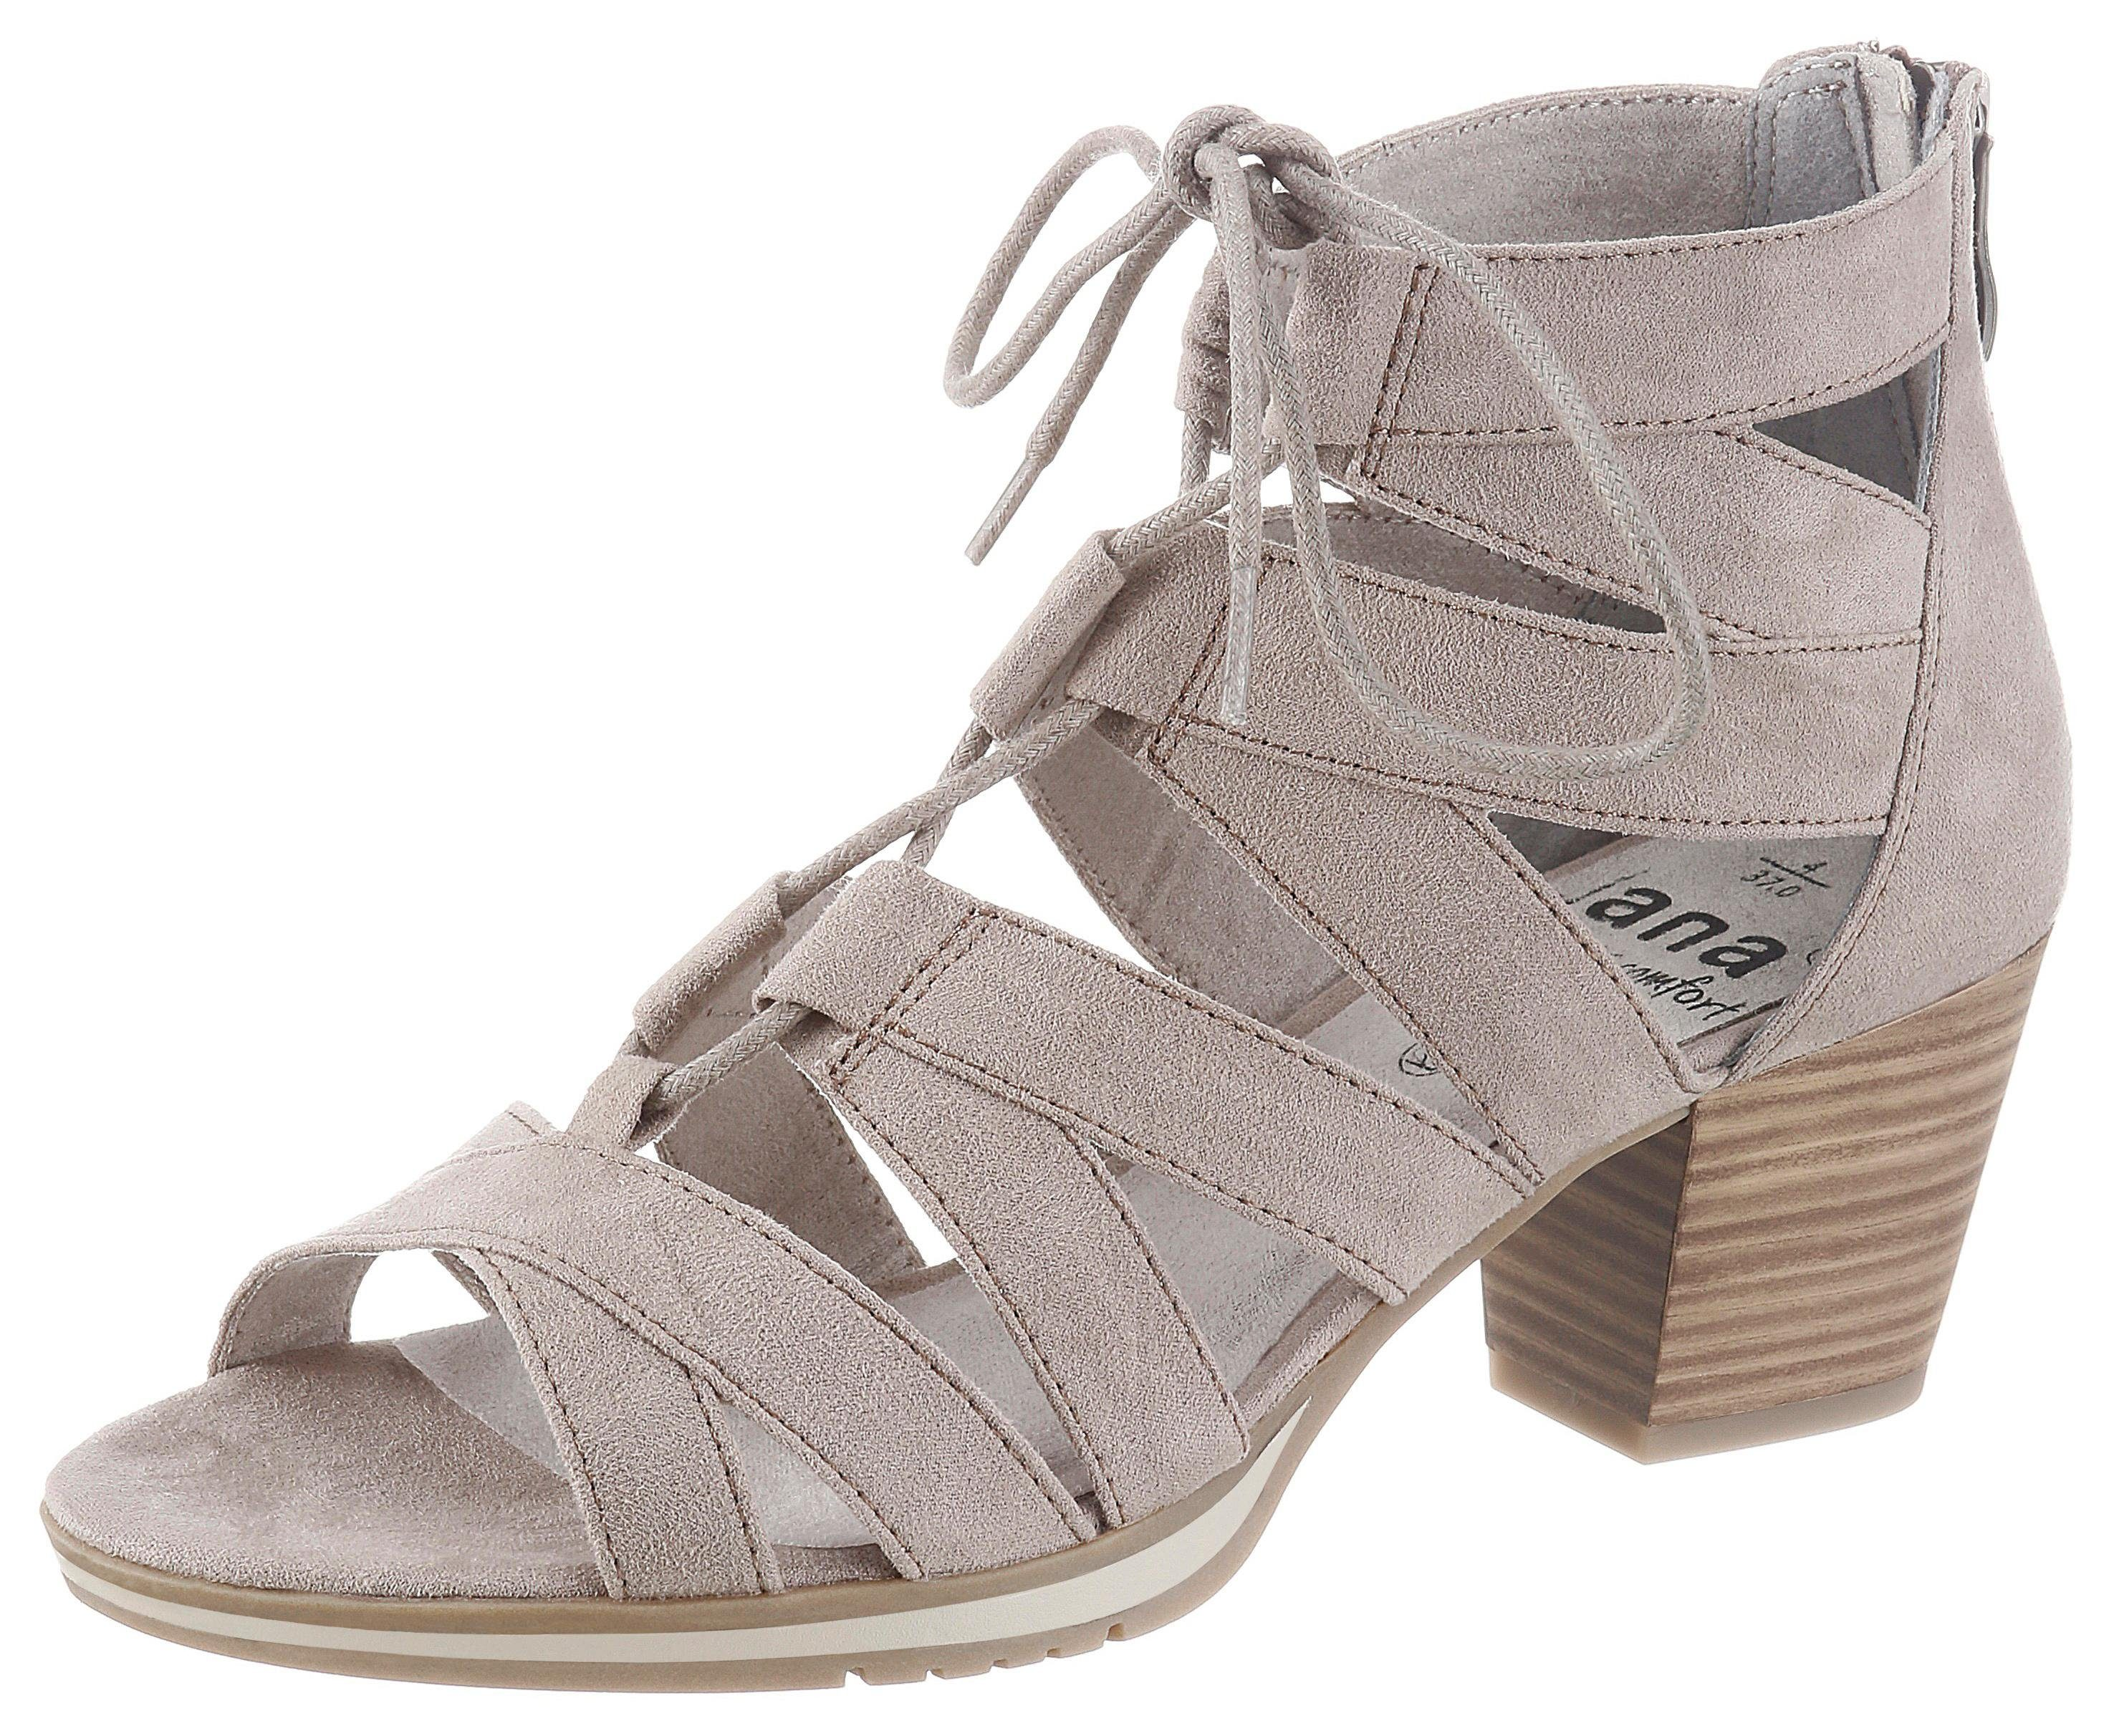 new styles 2c813 ff6bf Jana Sandalette